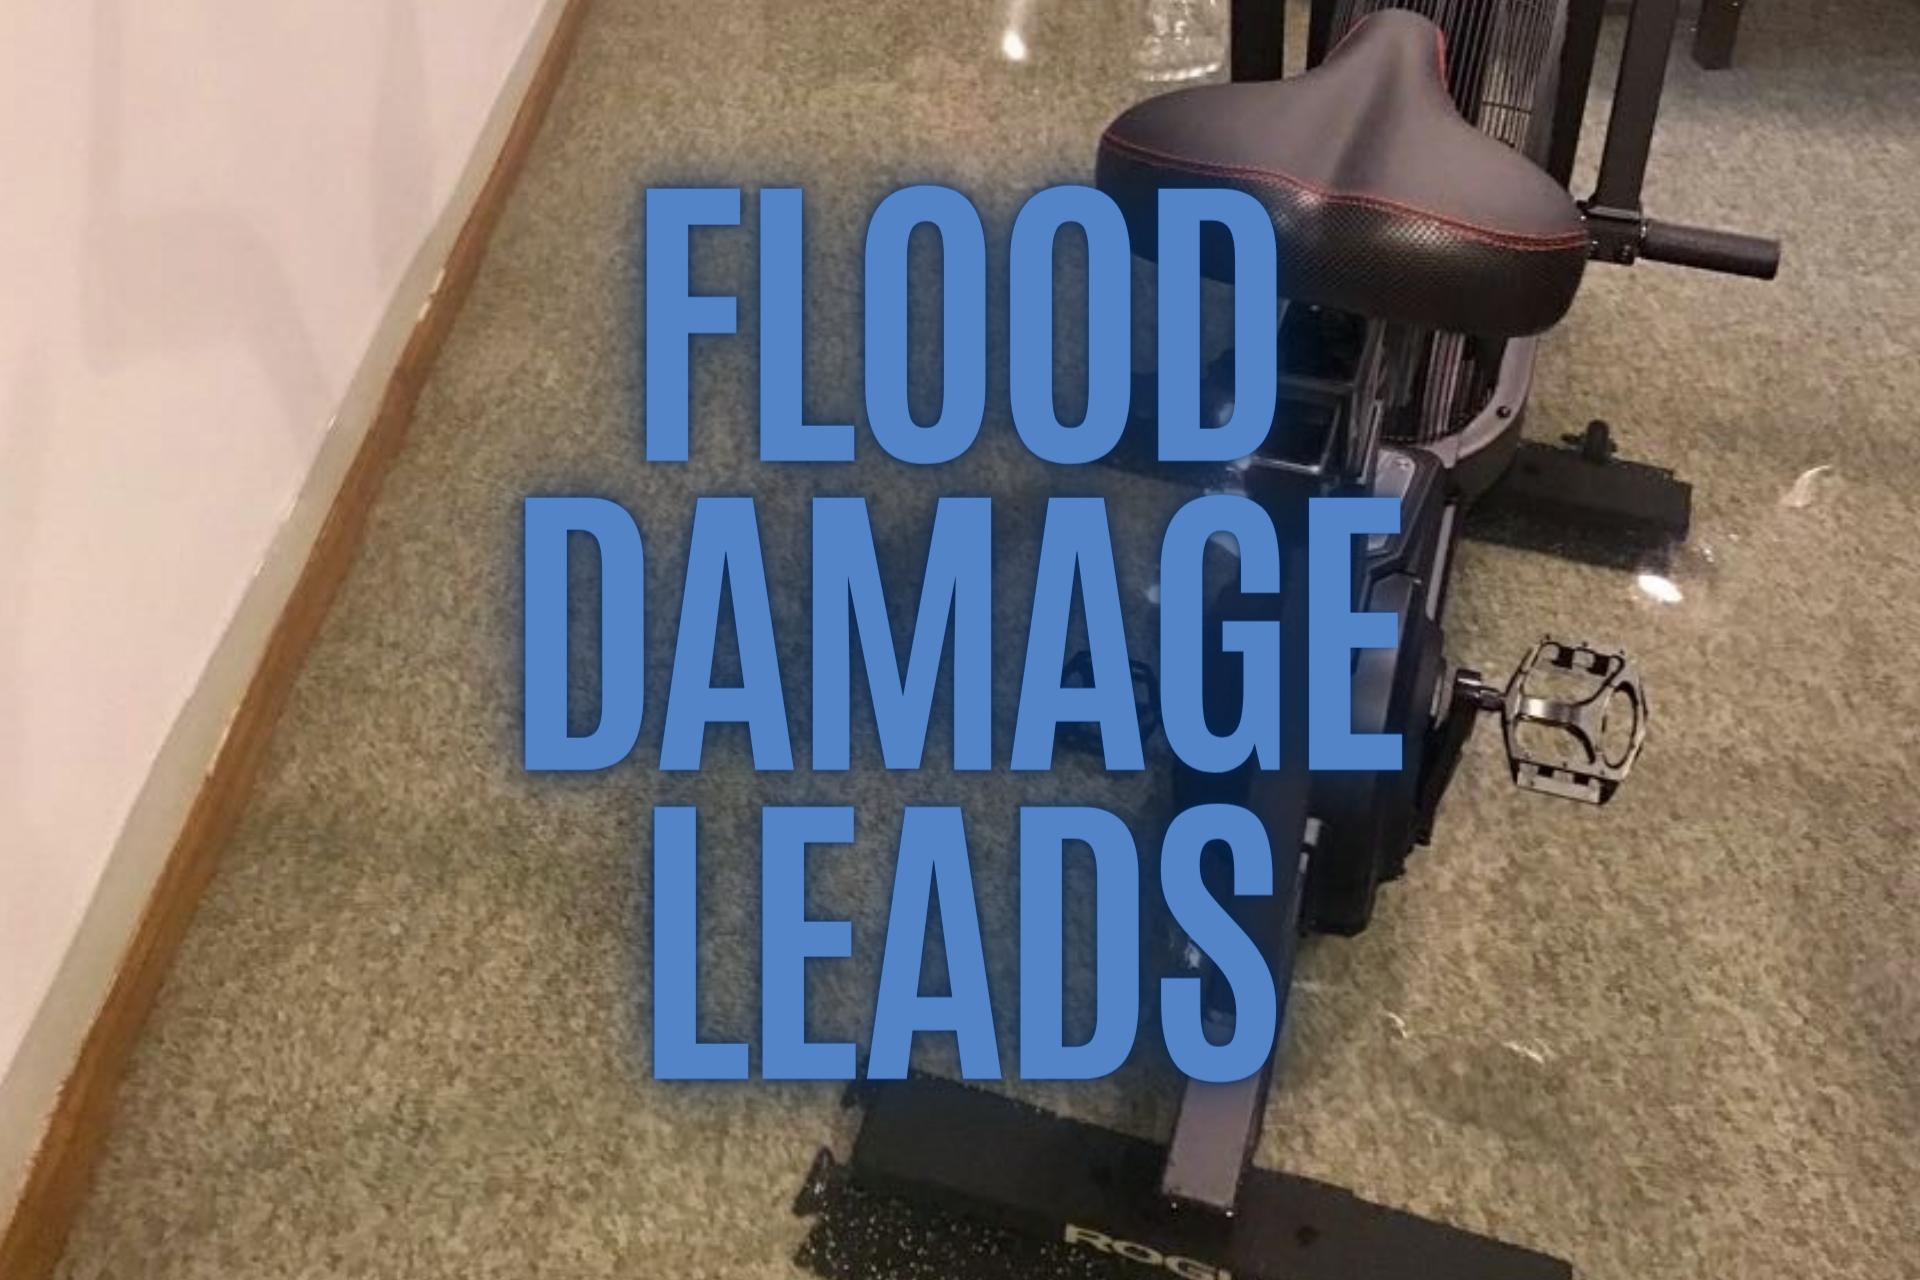 Flood damage leads